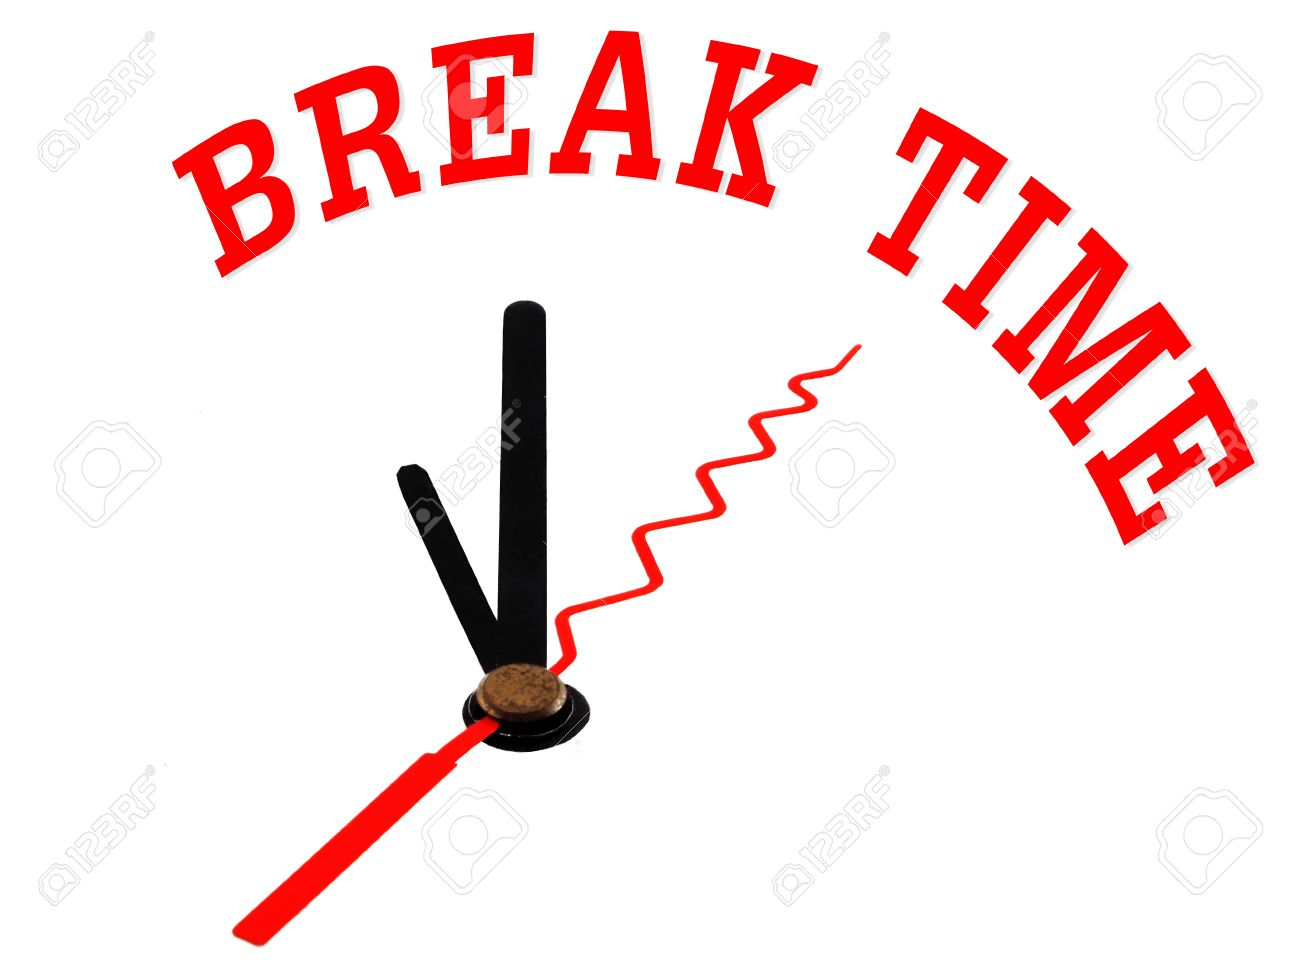 Break Time Clipart.